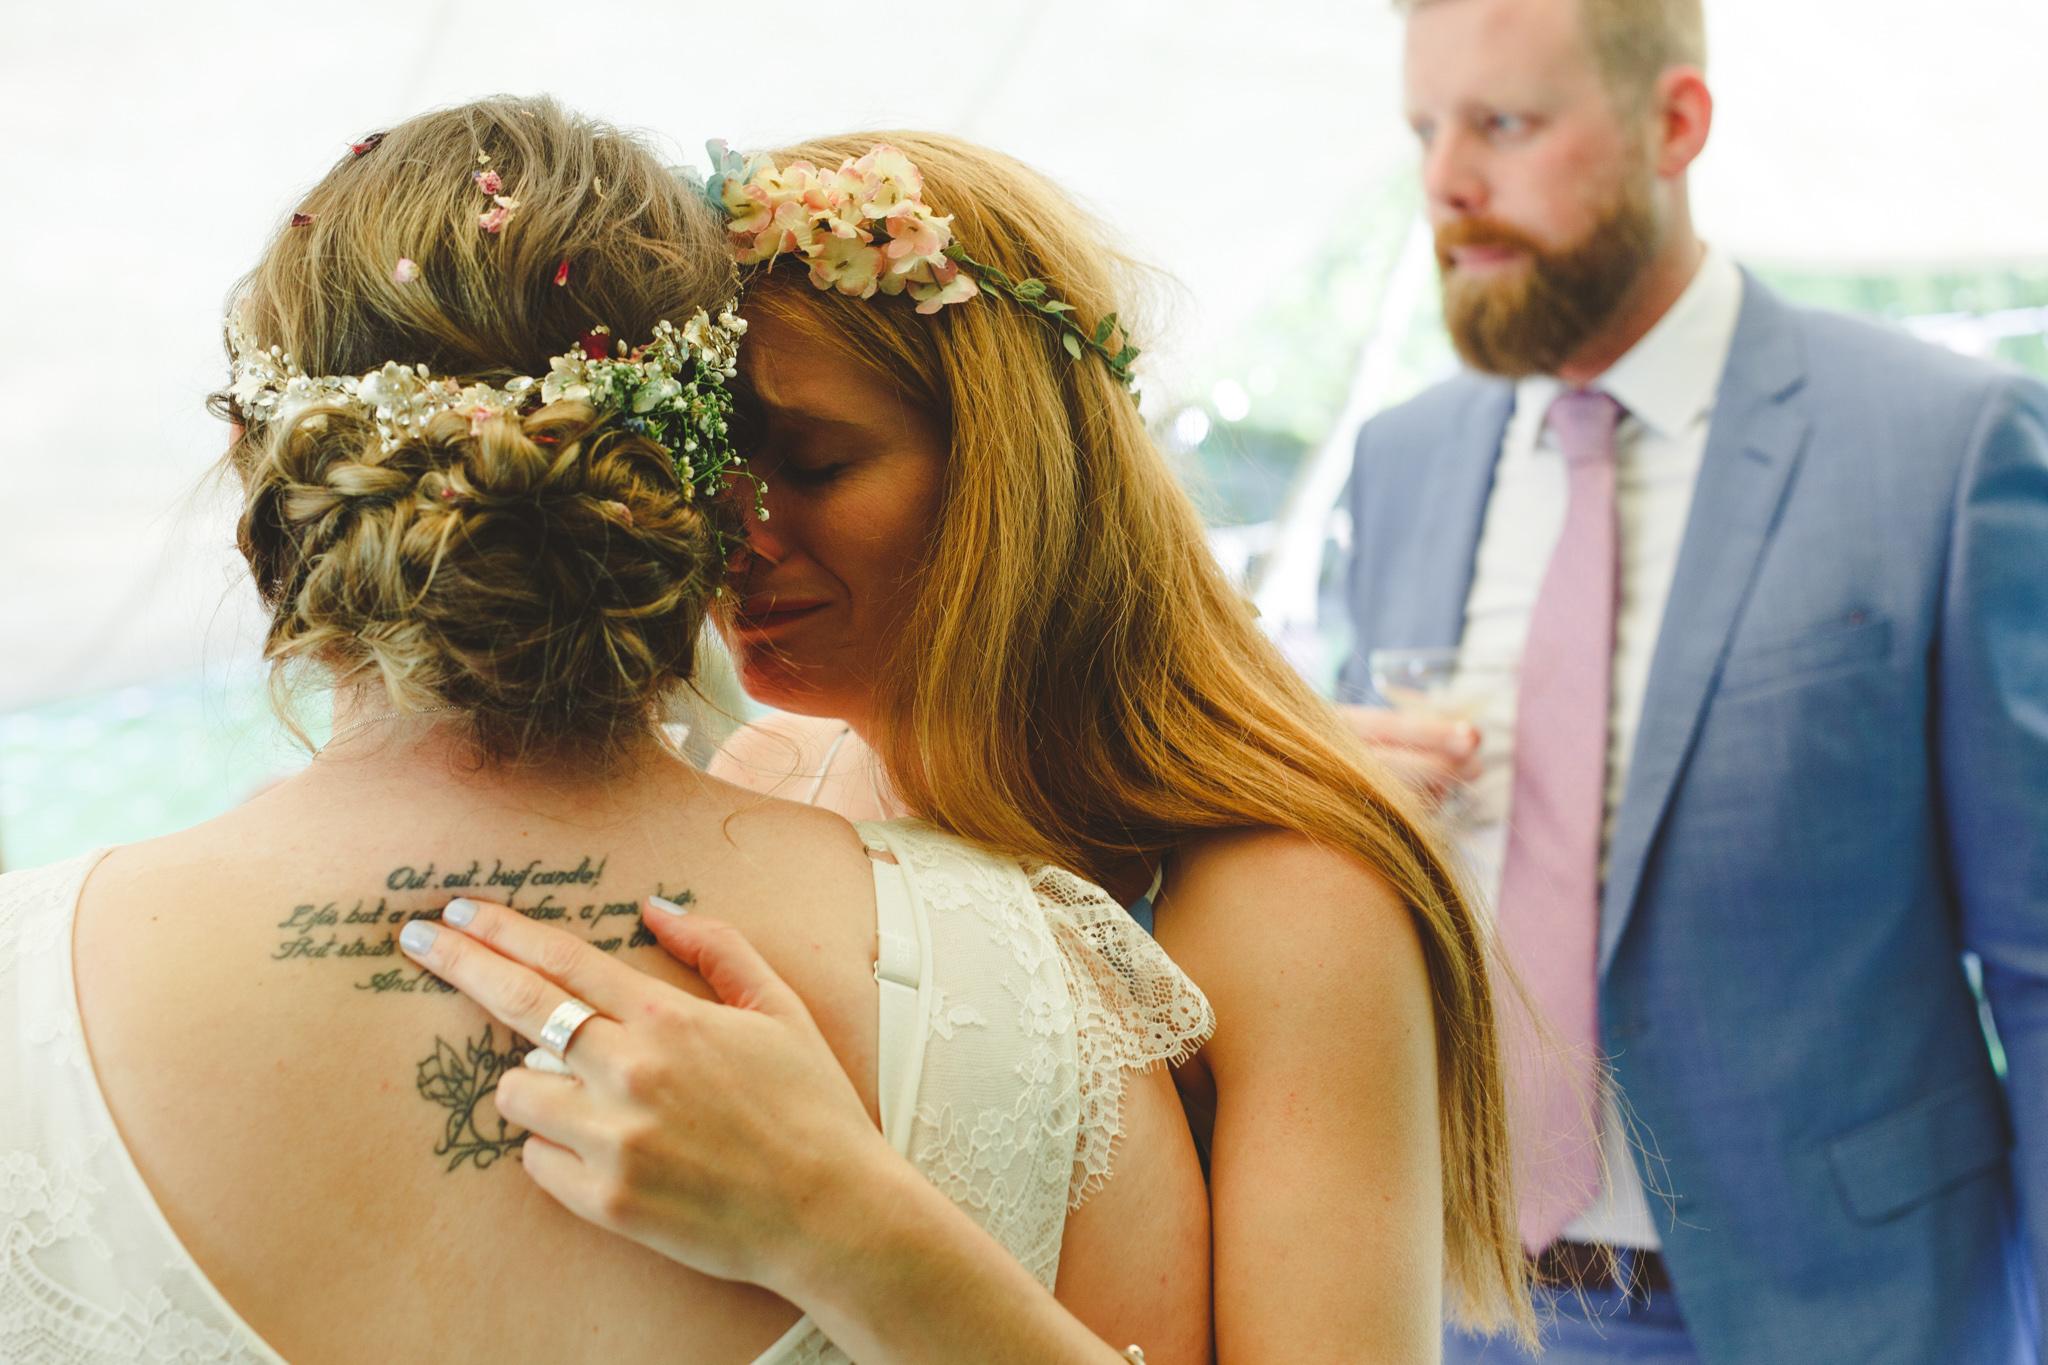 derbyshire-wedding-photographer-videographer-camera-hannah-3.jpg